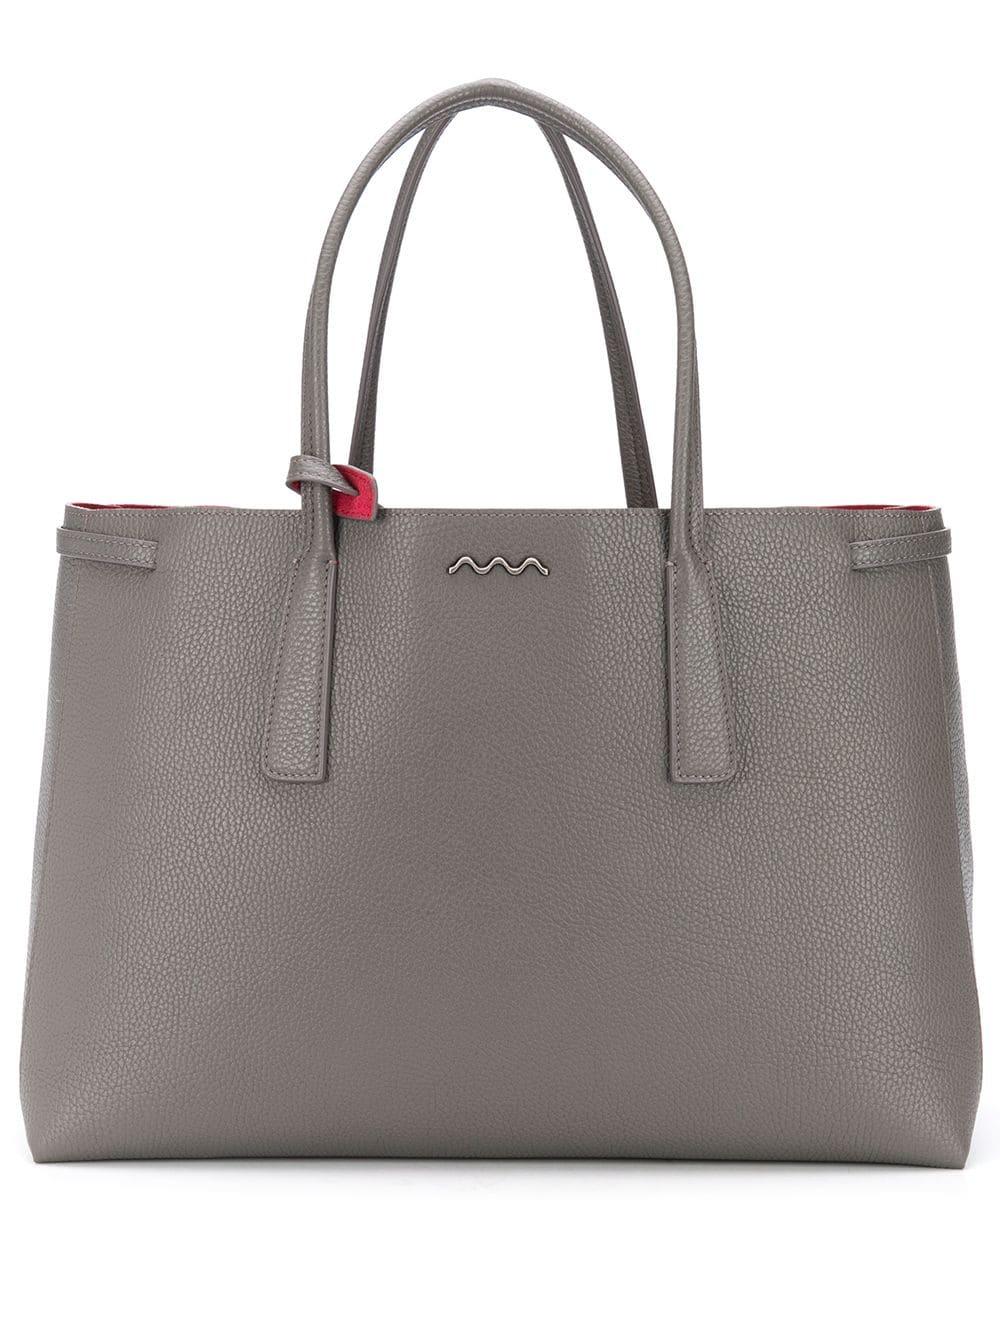 Duo Metropolitan Leather Bag